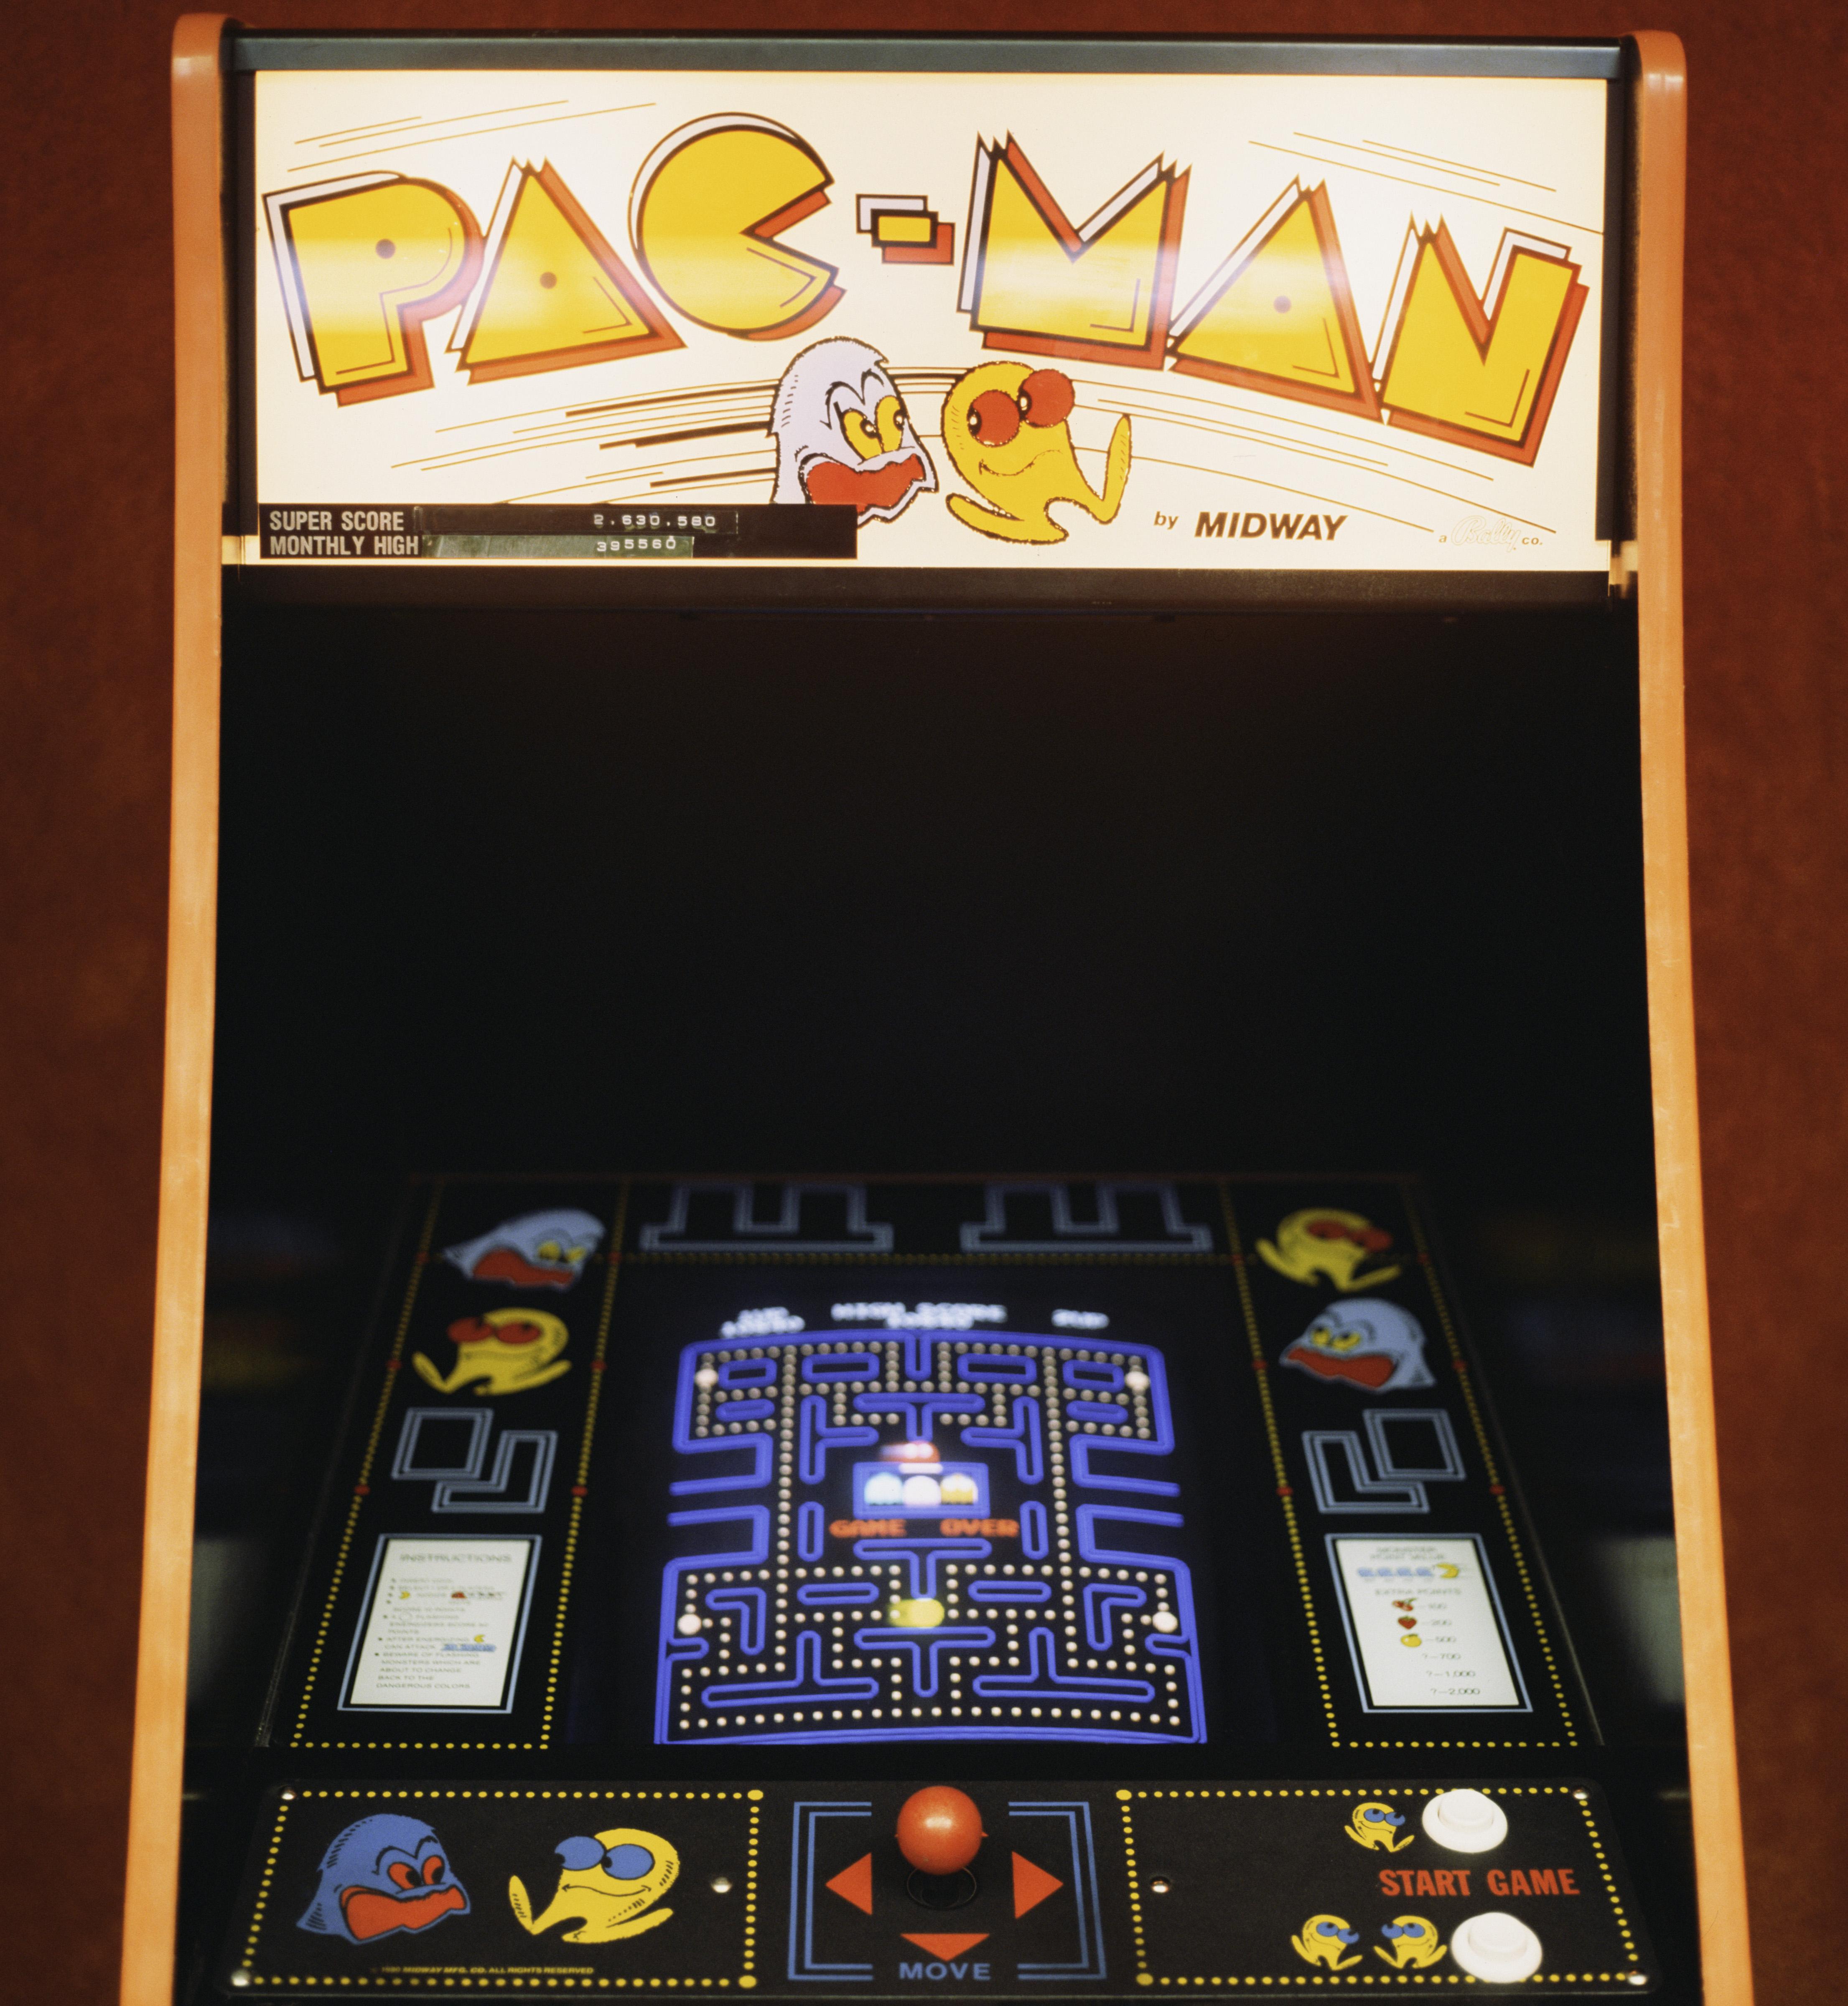 Pac-Man arcade game.